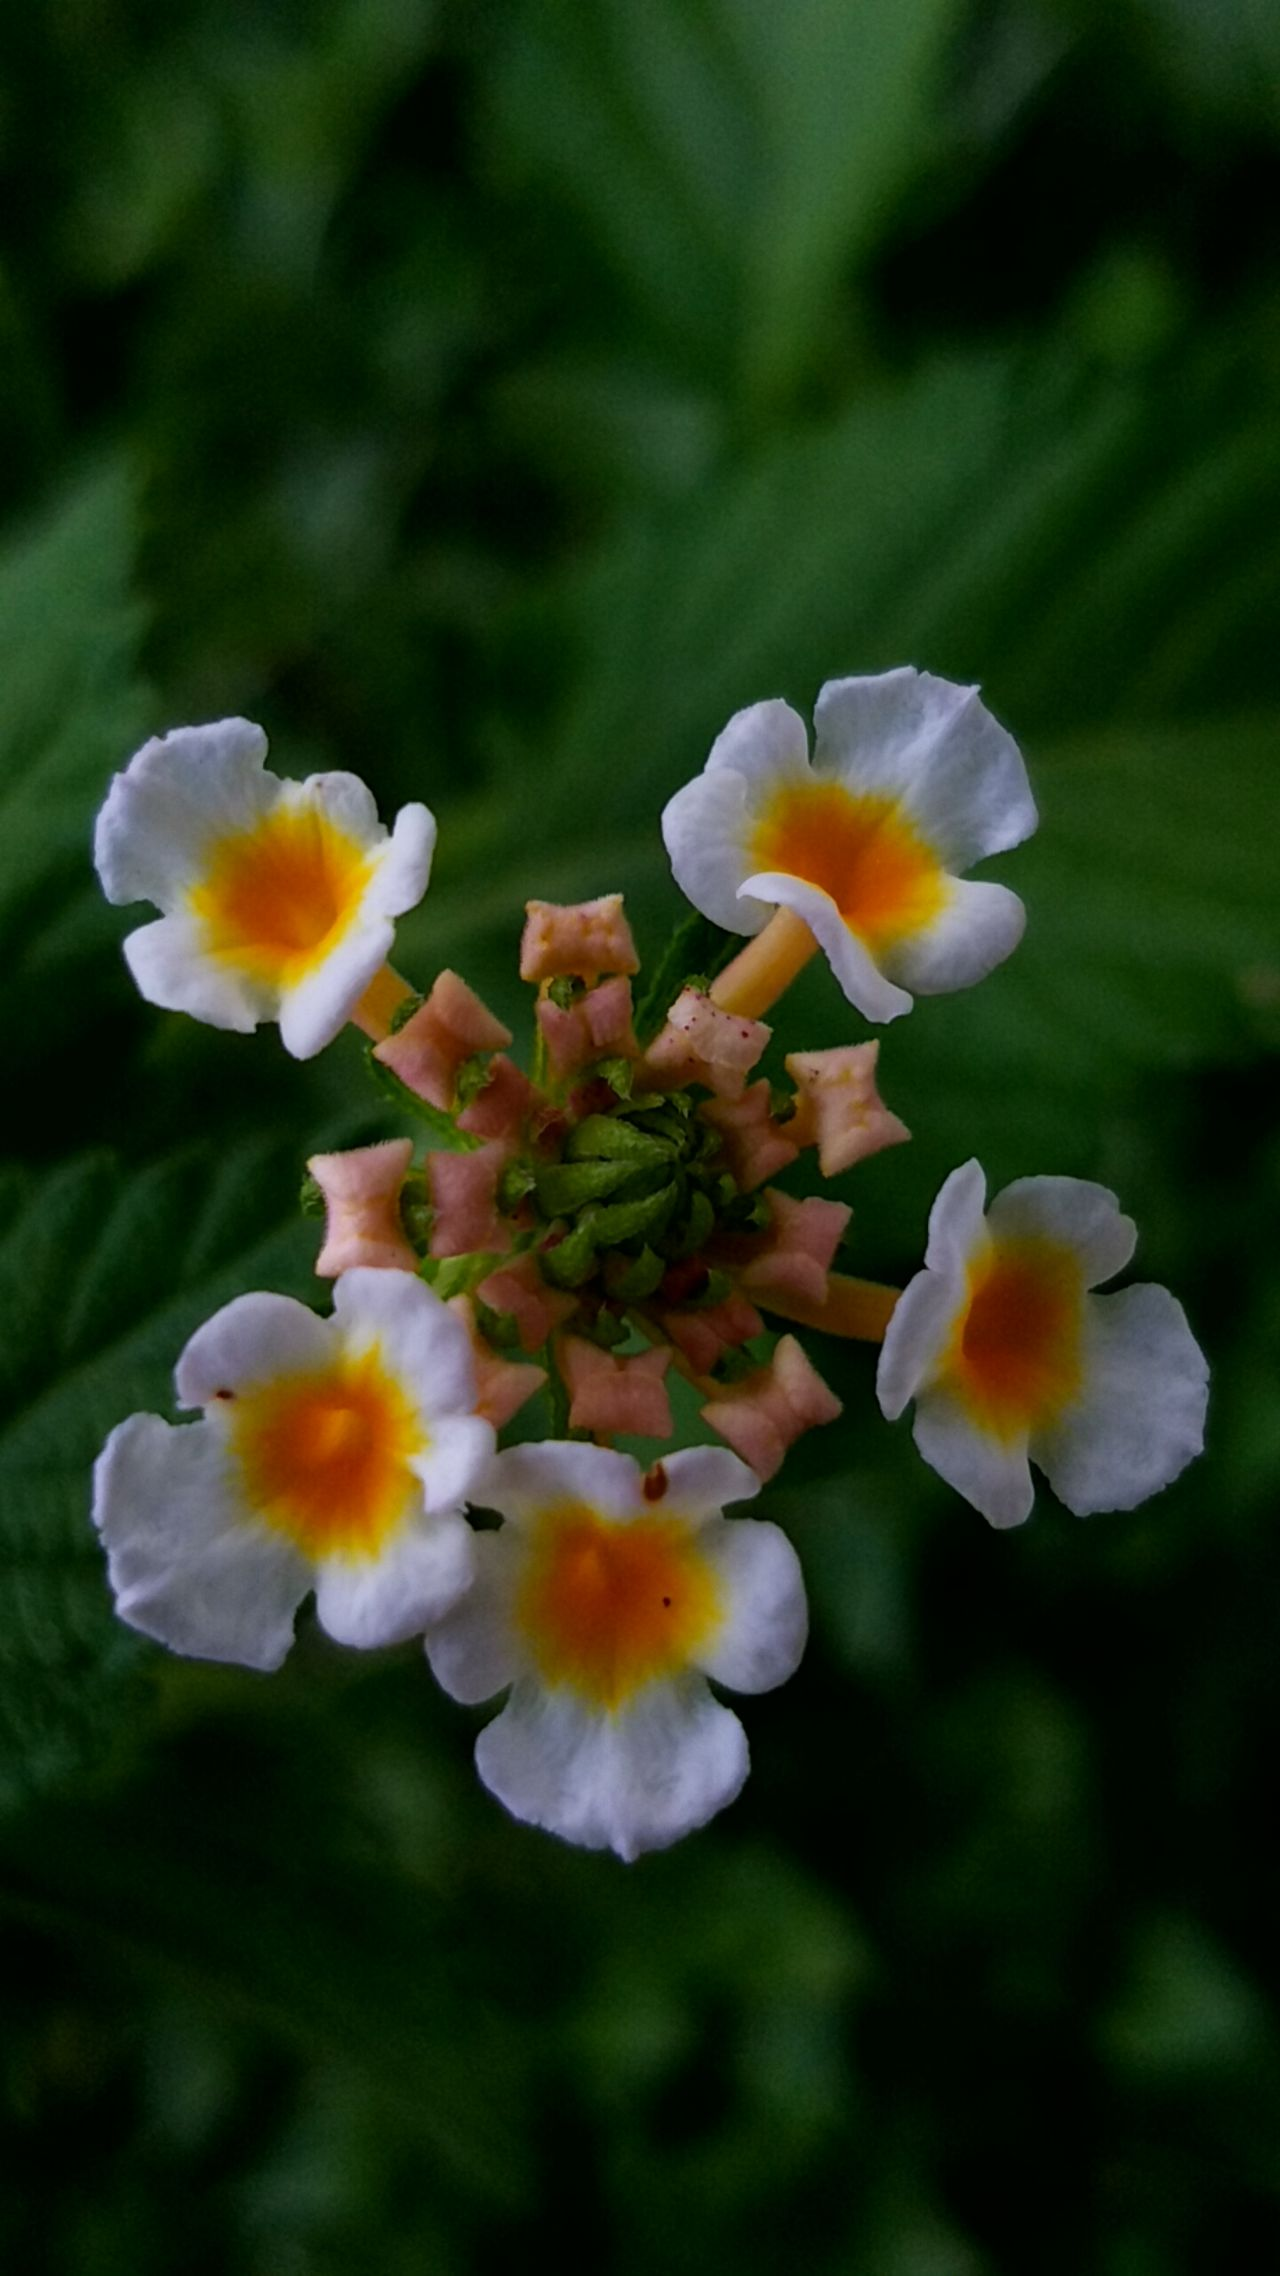 Symplicity Lantana Flower Symmetry In Nature Fractals In Nature Fibonacci Green Color White Flowers Beautiful Nature